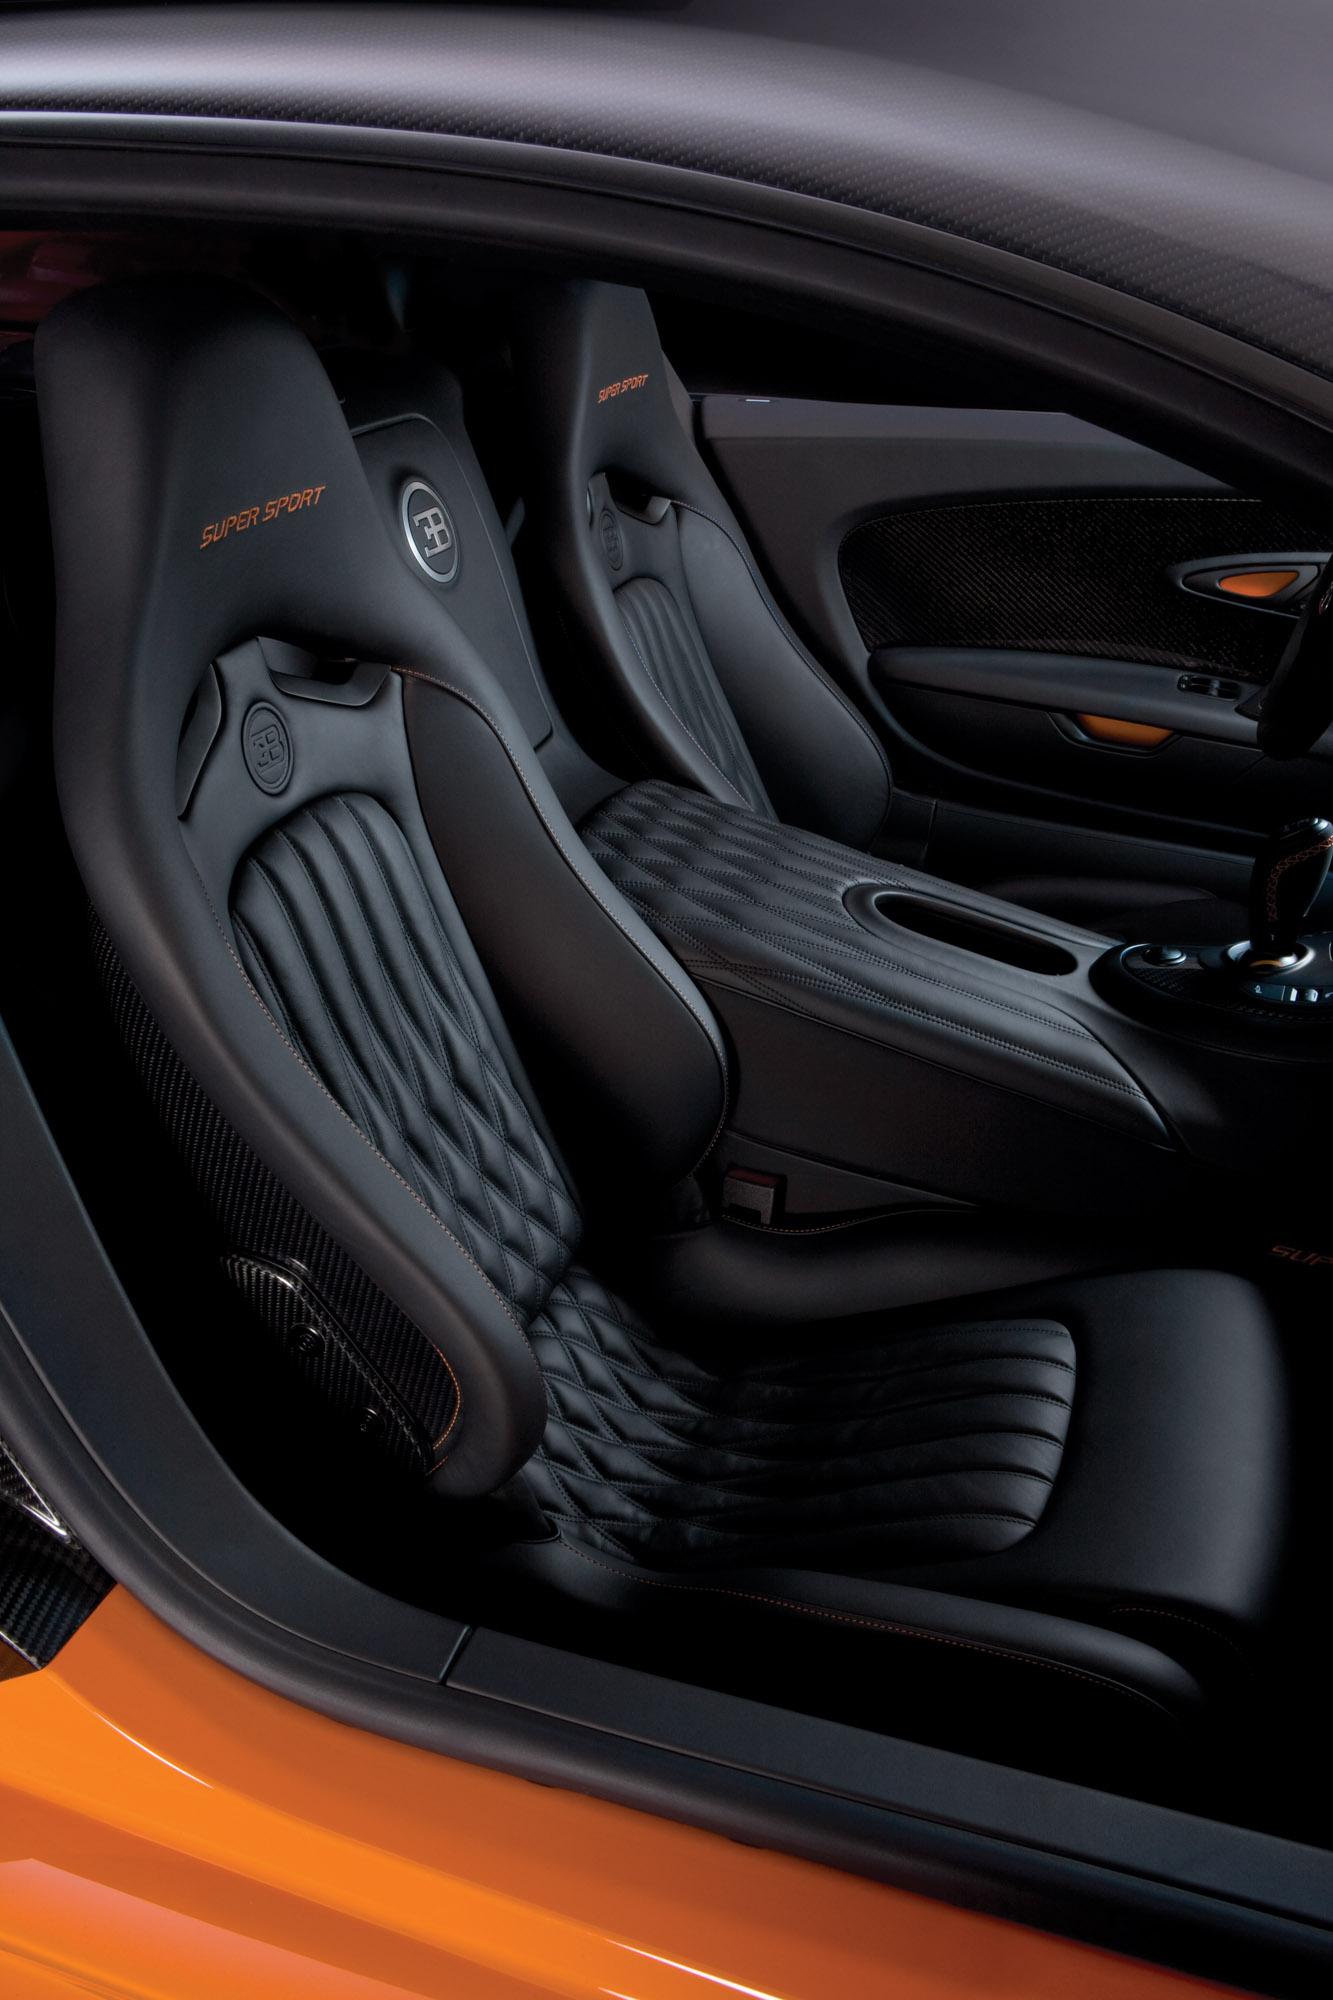 bugatti veyron 16 4 super sport 431 km h. Black Bedroom Furniture Sets. Home Design Ideas